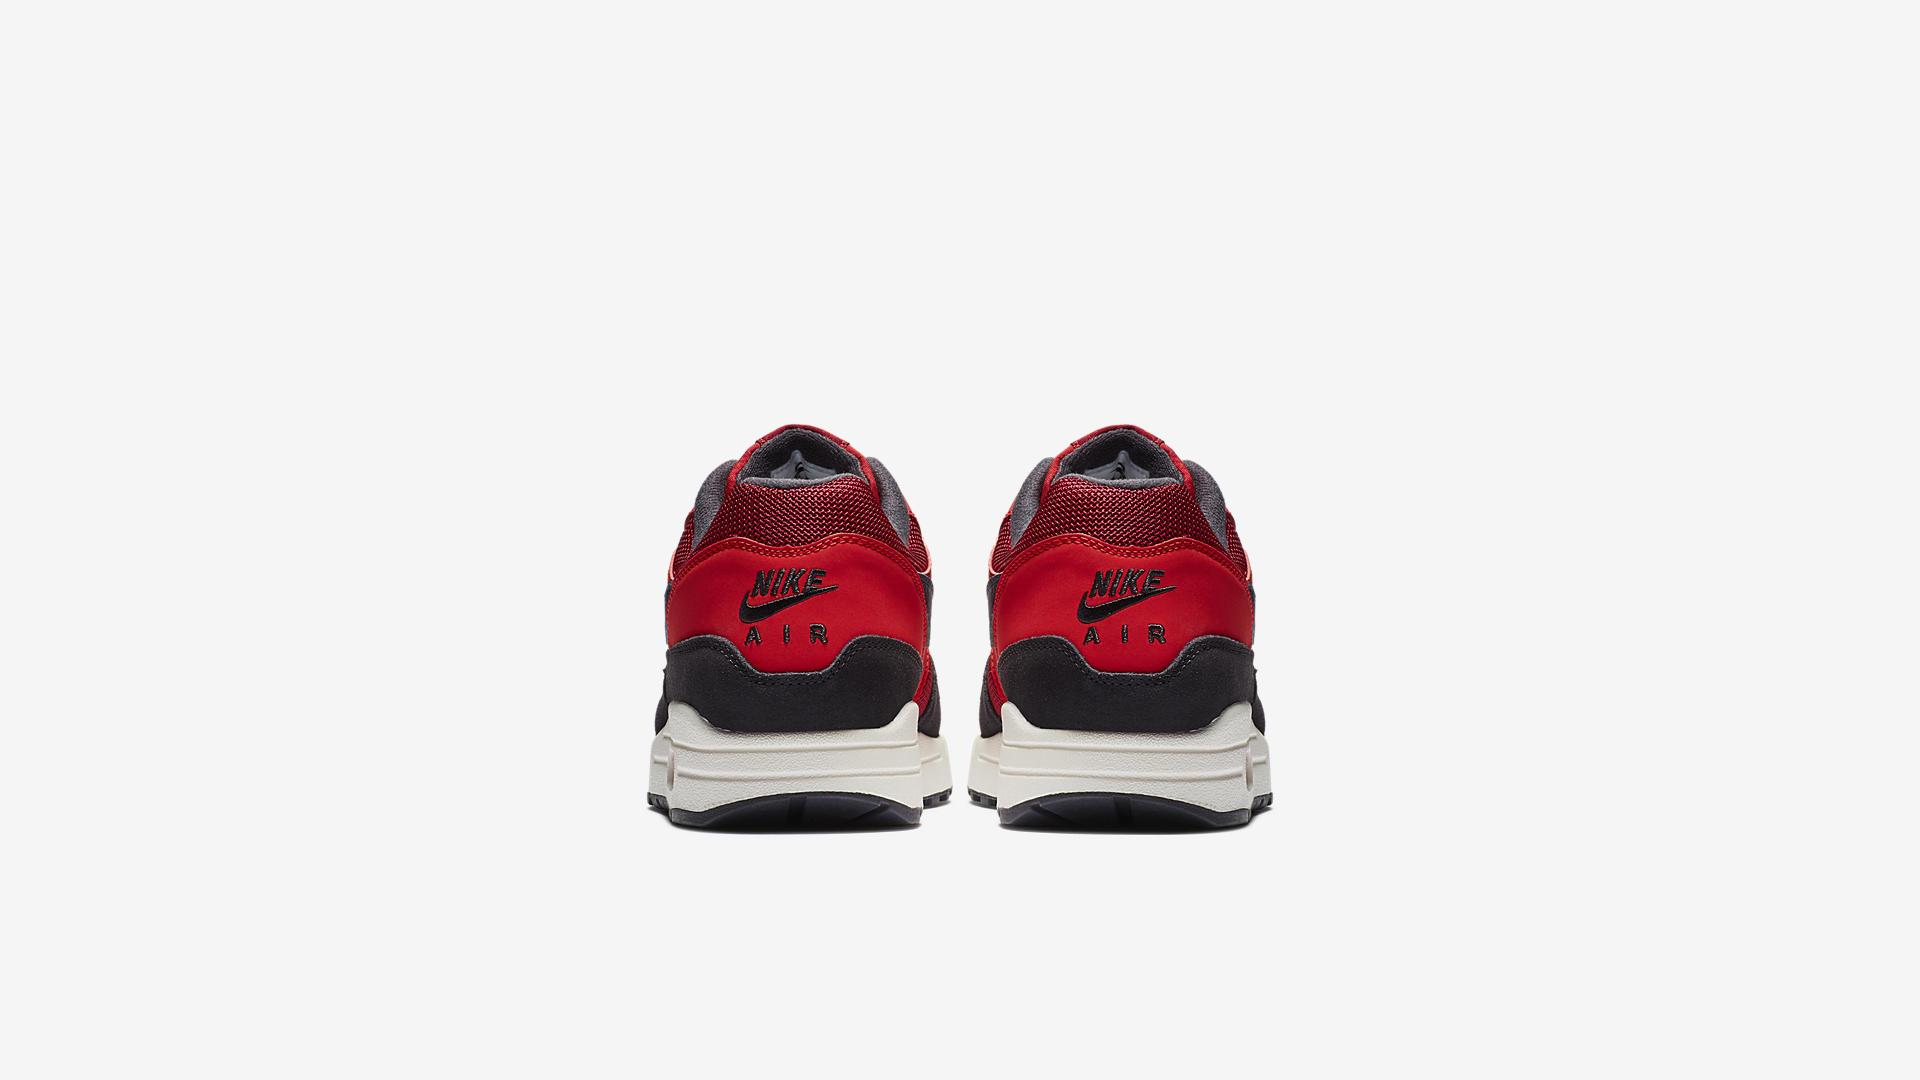 Nike Air Max 1 AH8145-600